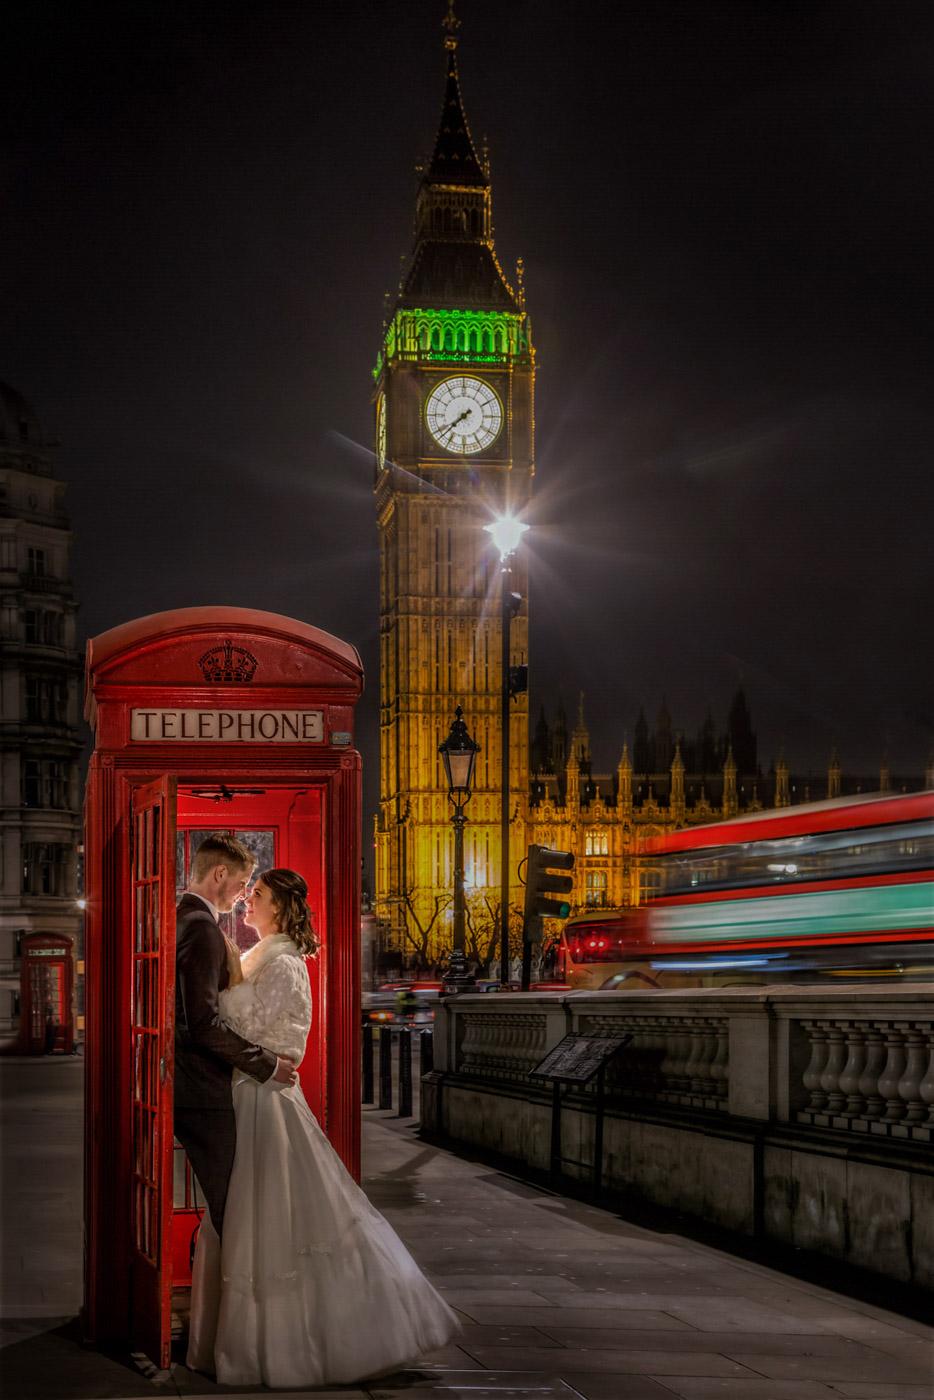 Wedding Photographer Training Courses